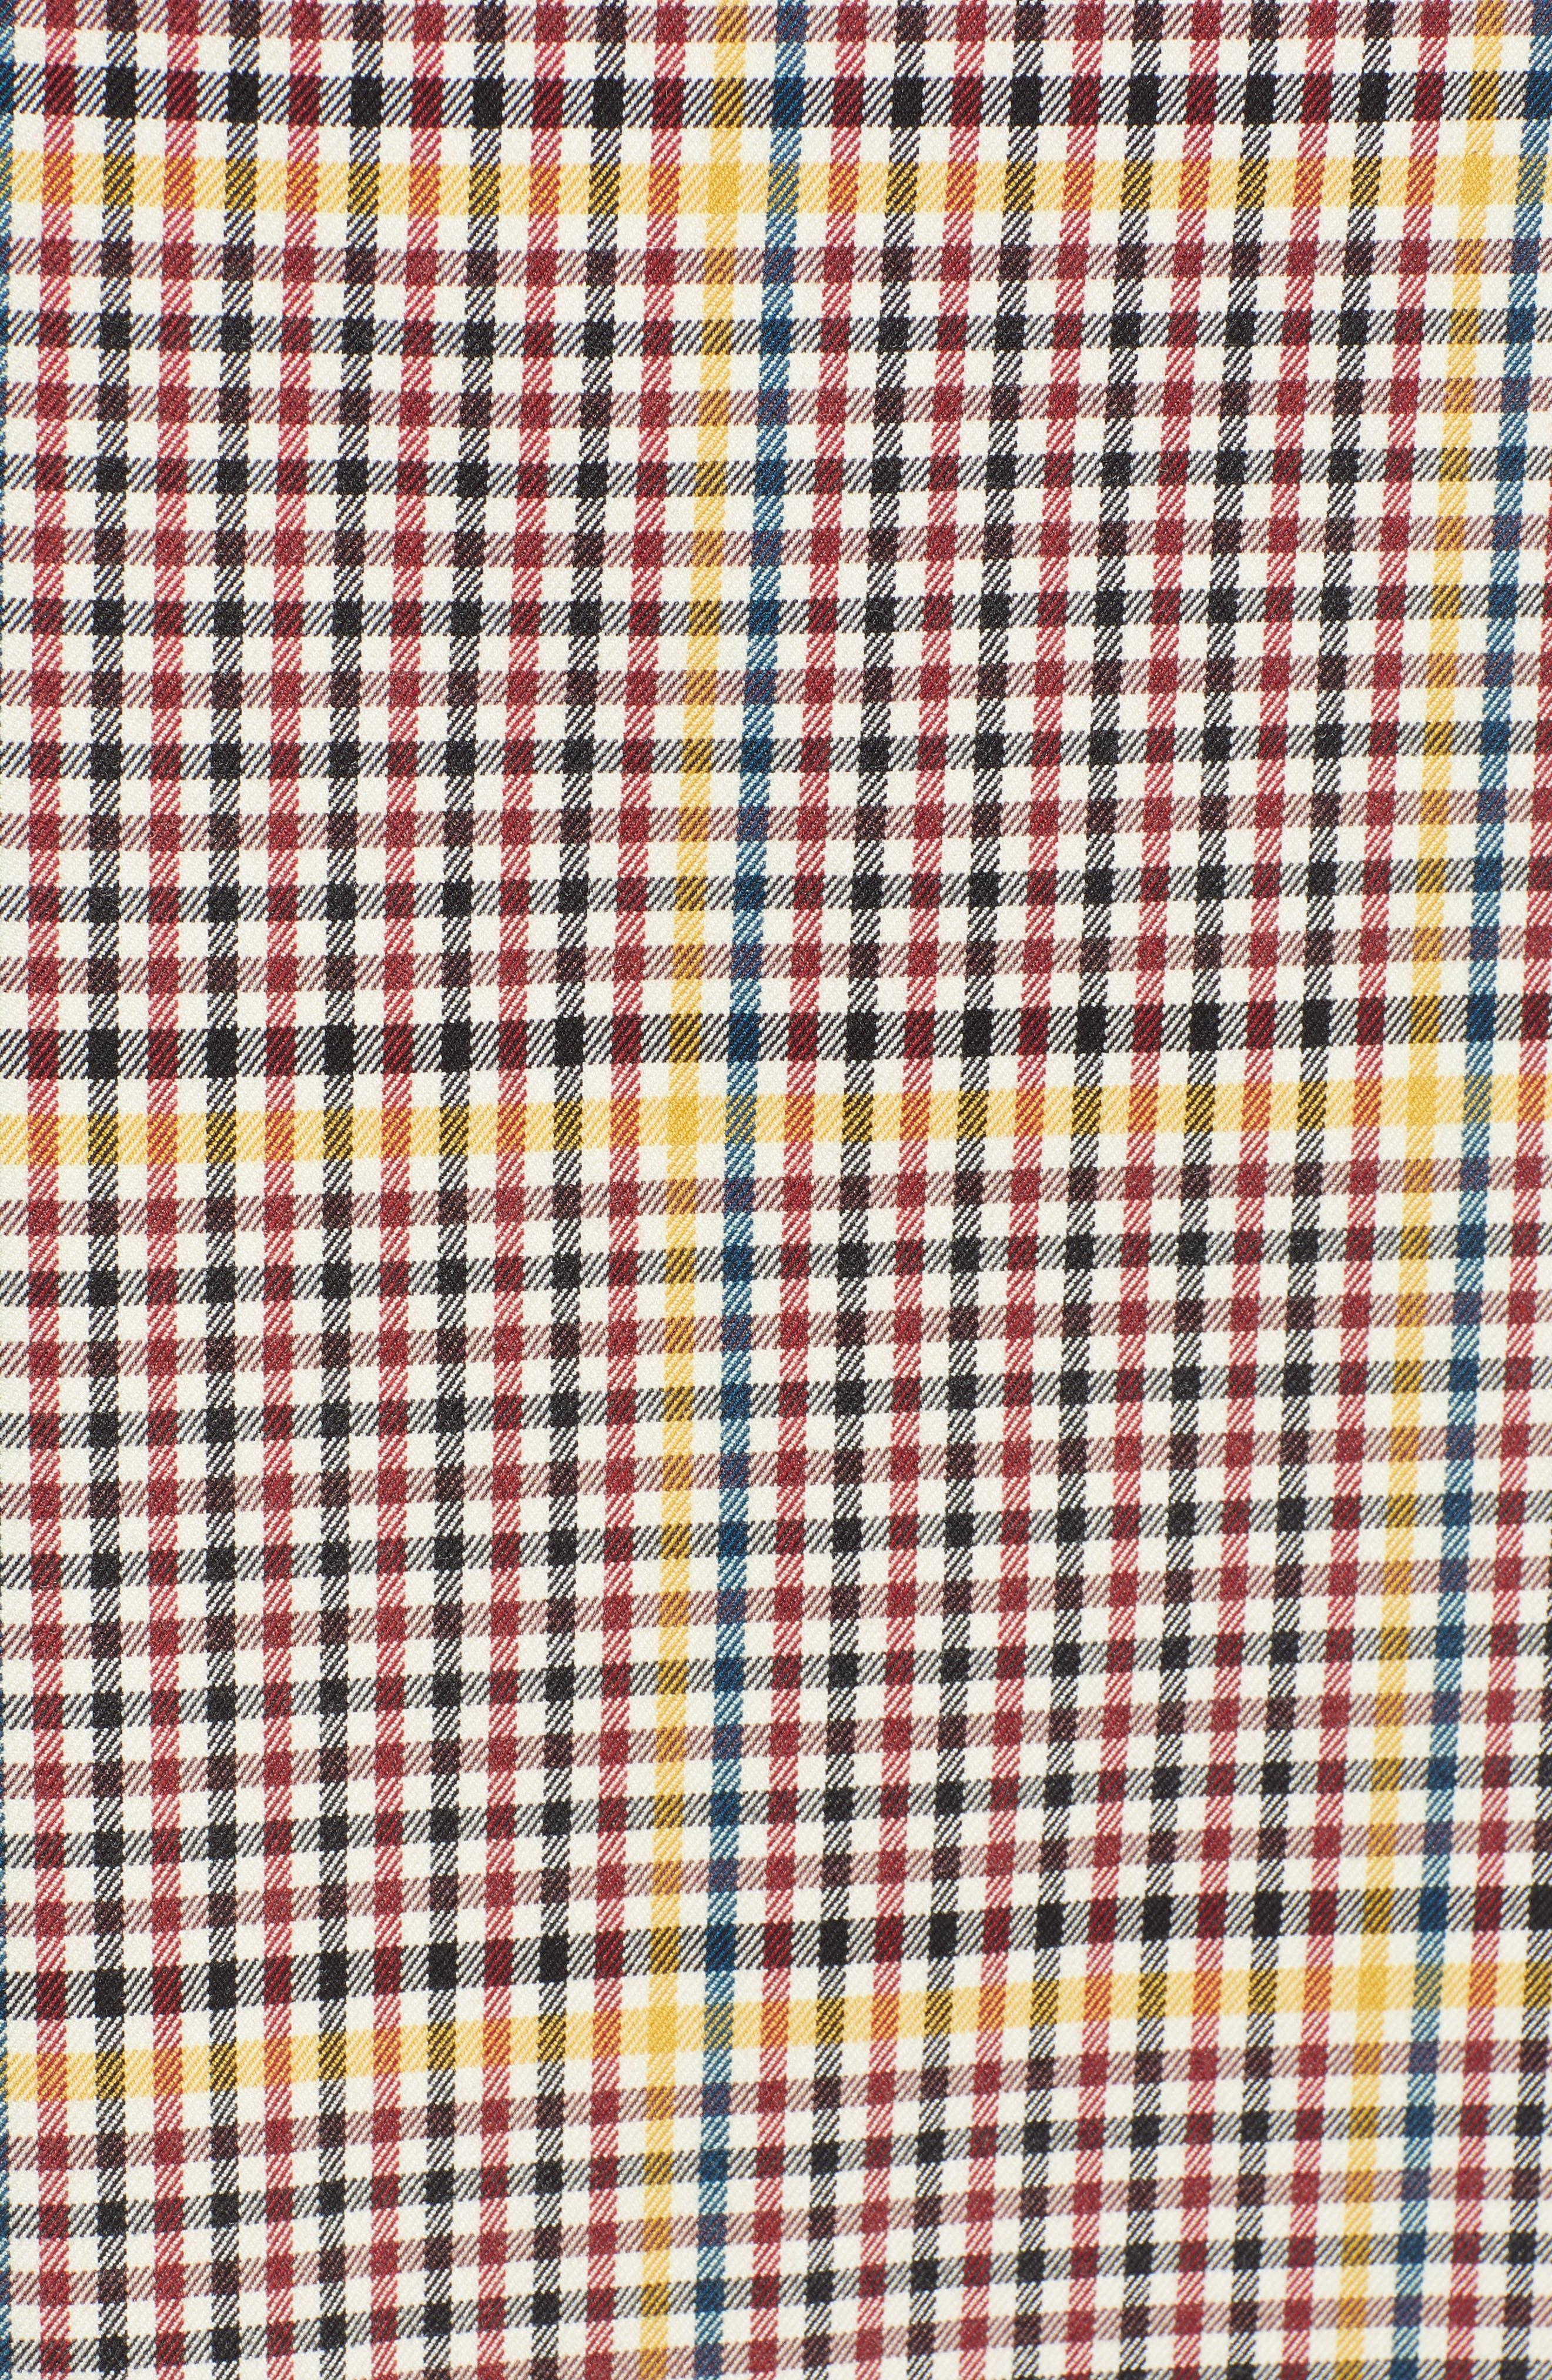 Plaid Pencil Skirt,                             Alternate thumbnail 5, color,                             601